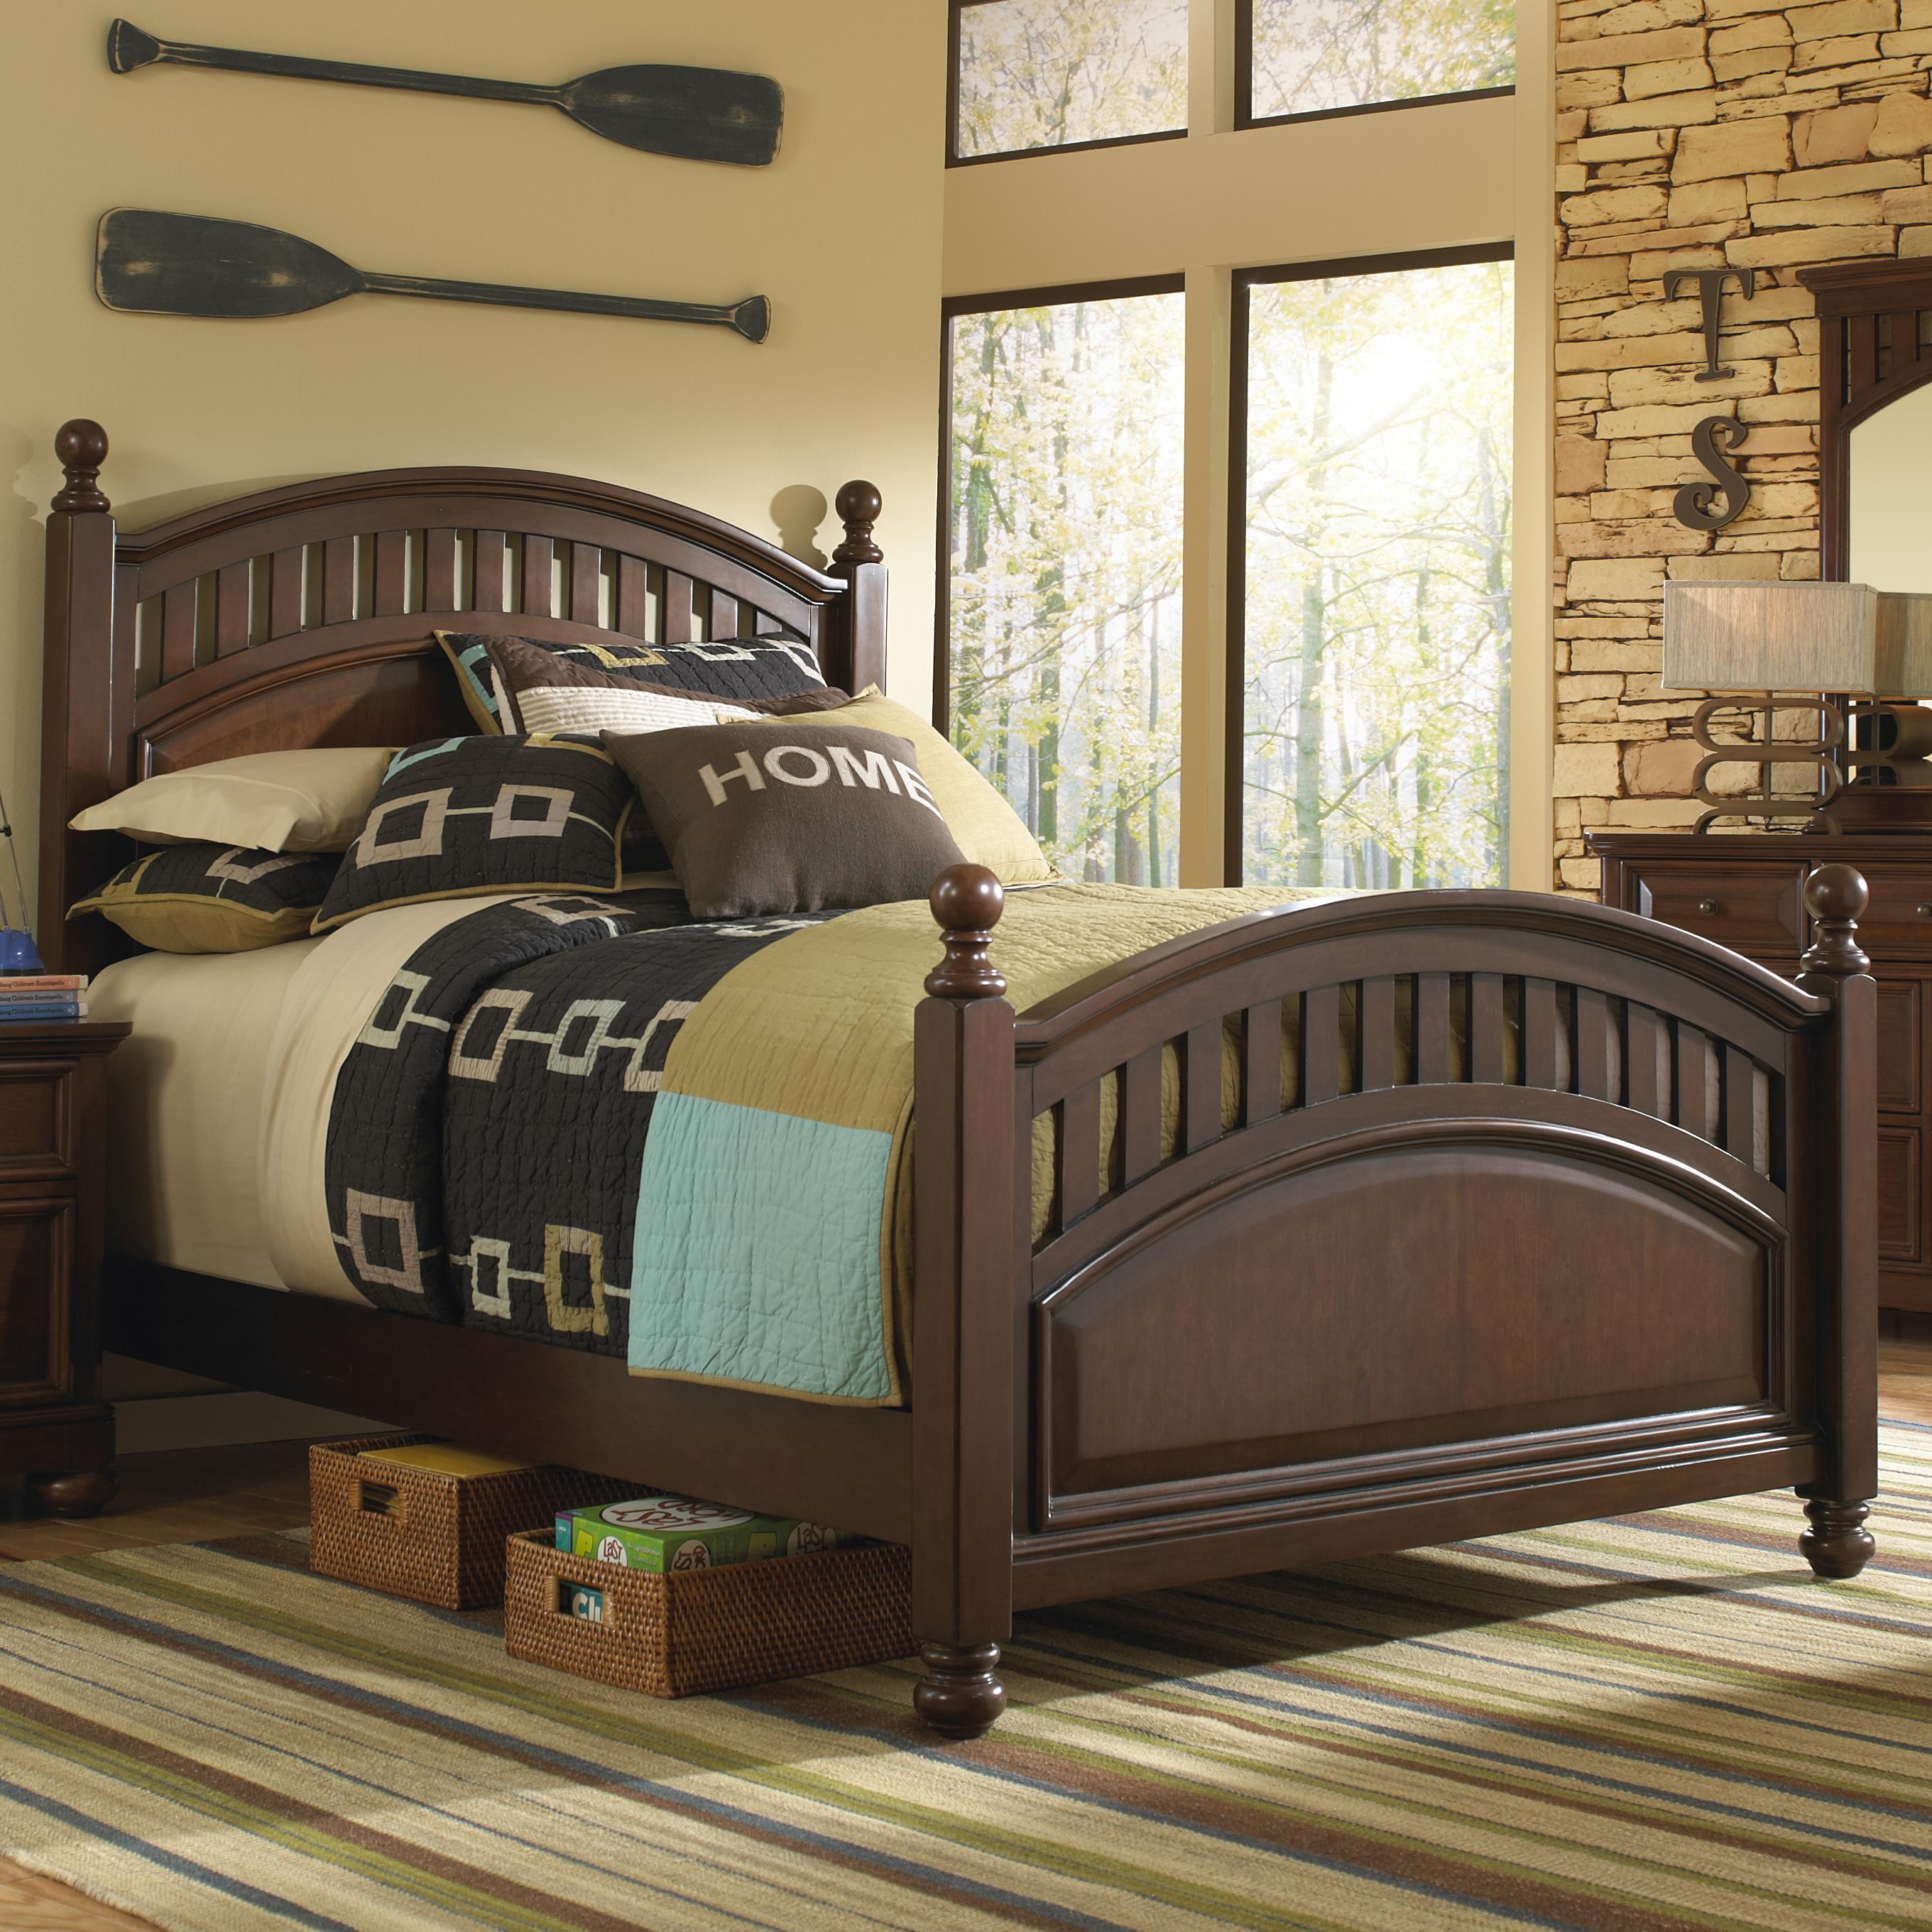 Morris Home Furnishings Edgewood Edgewood Full Post Bed - Item Number: 8468-632+633+401